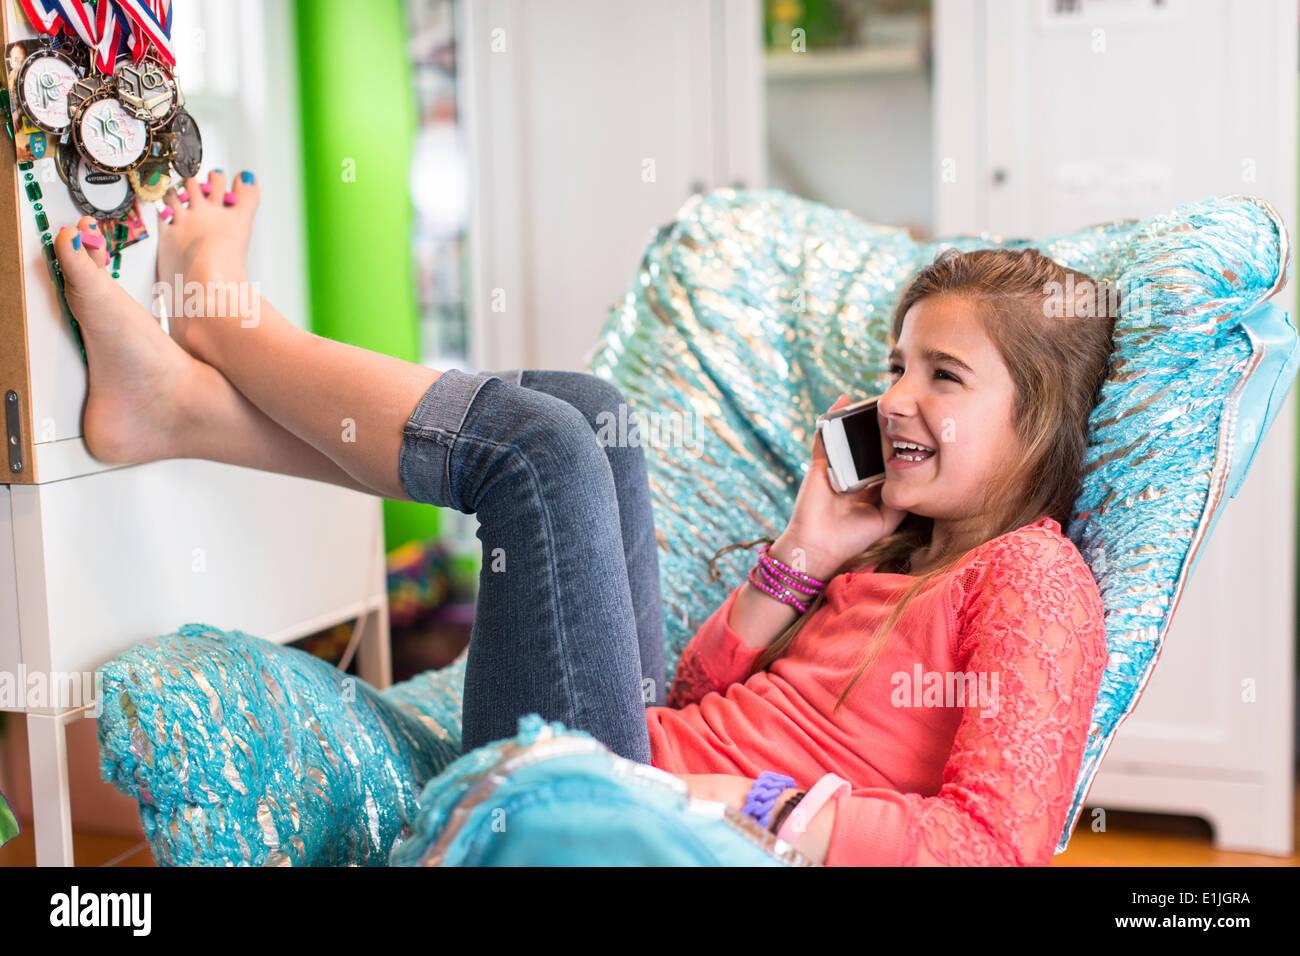 Girl sitting on armchair on phonecall - Stock Image